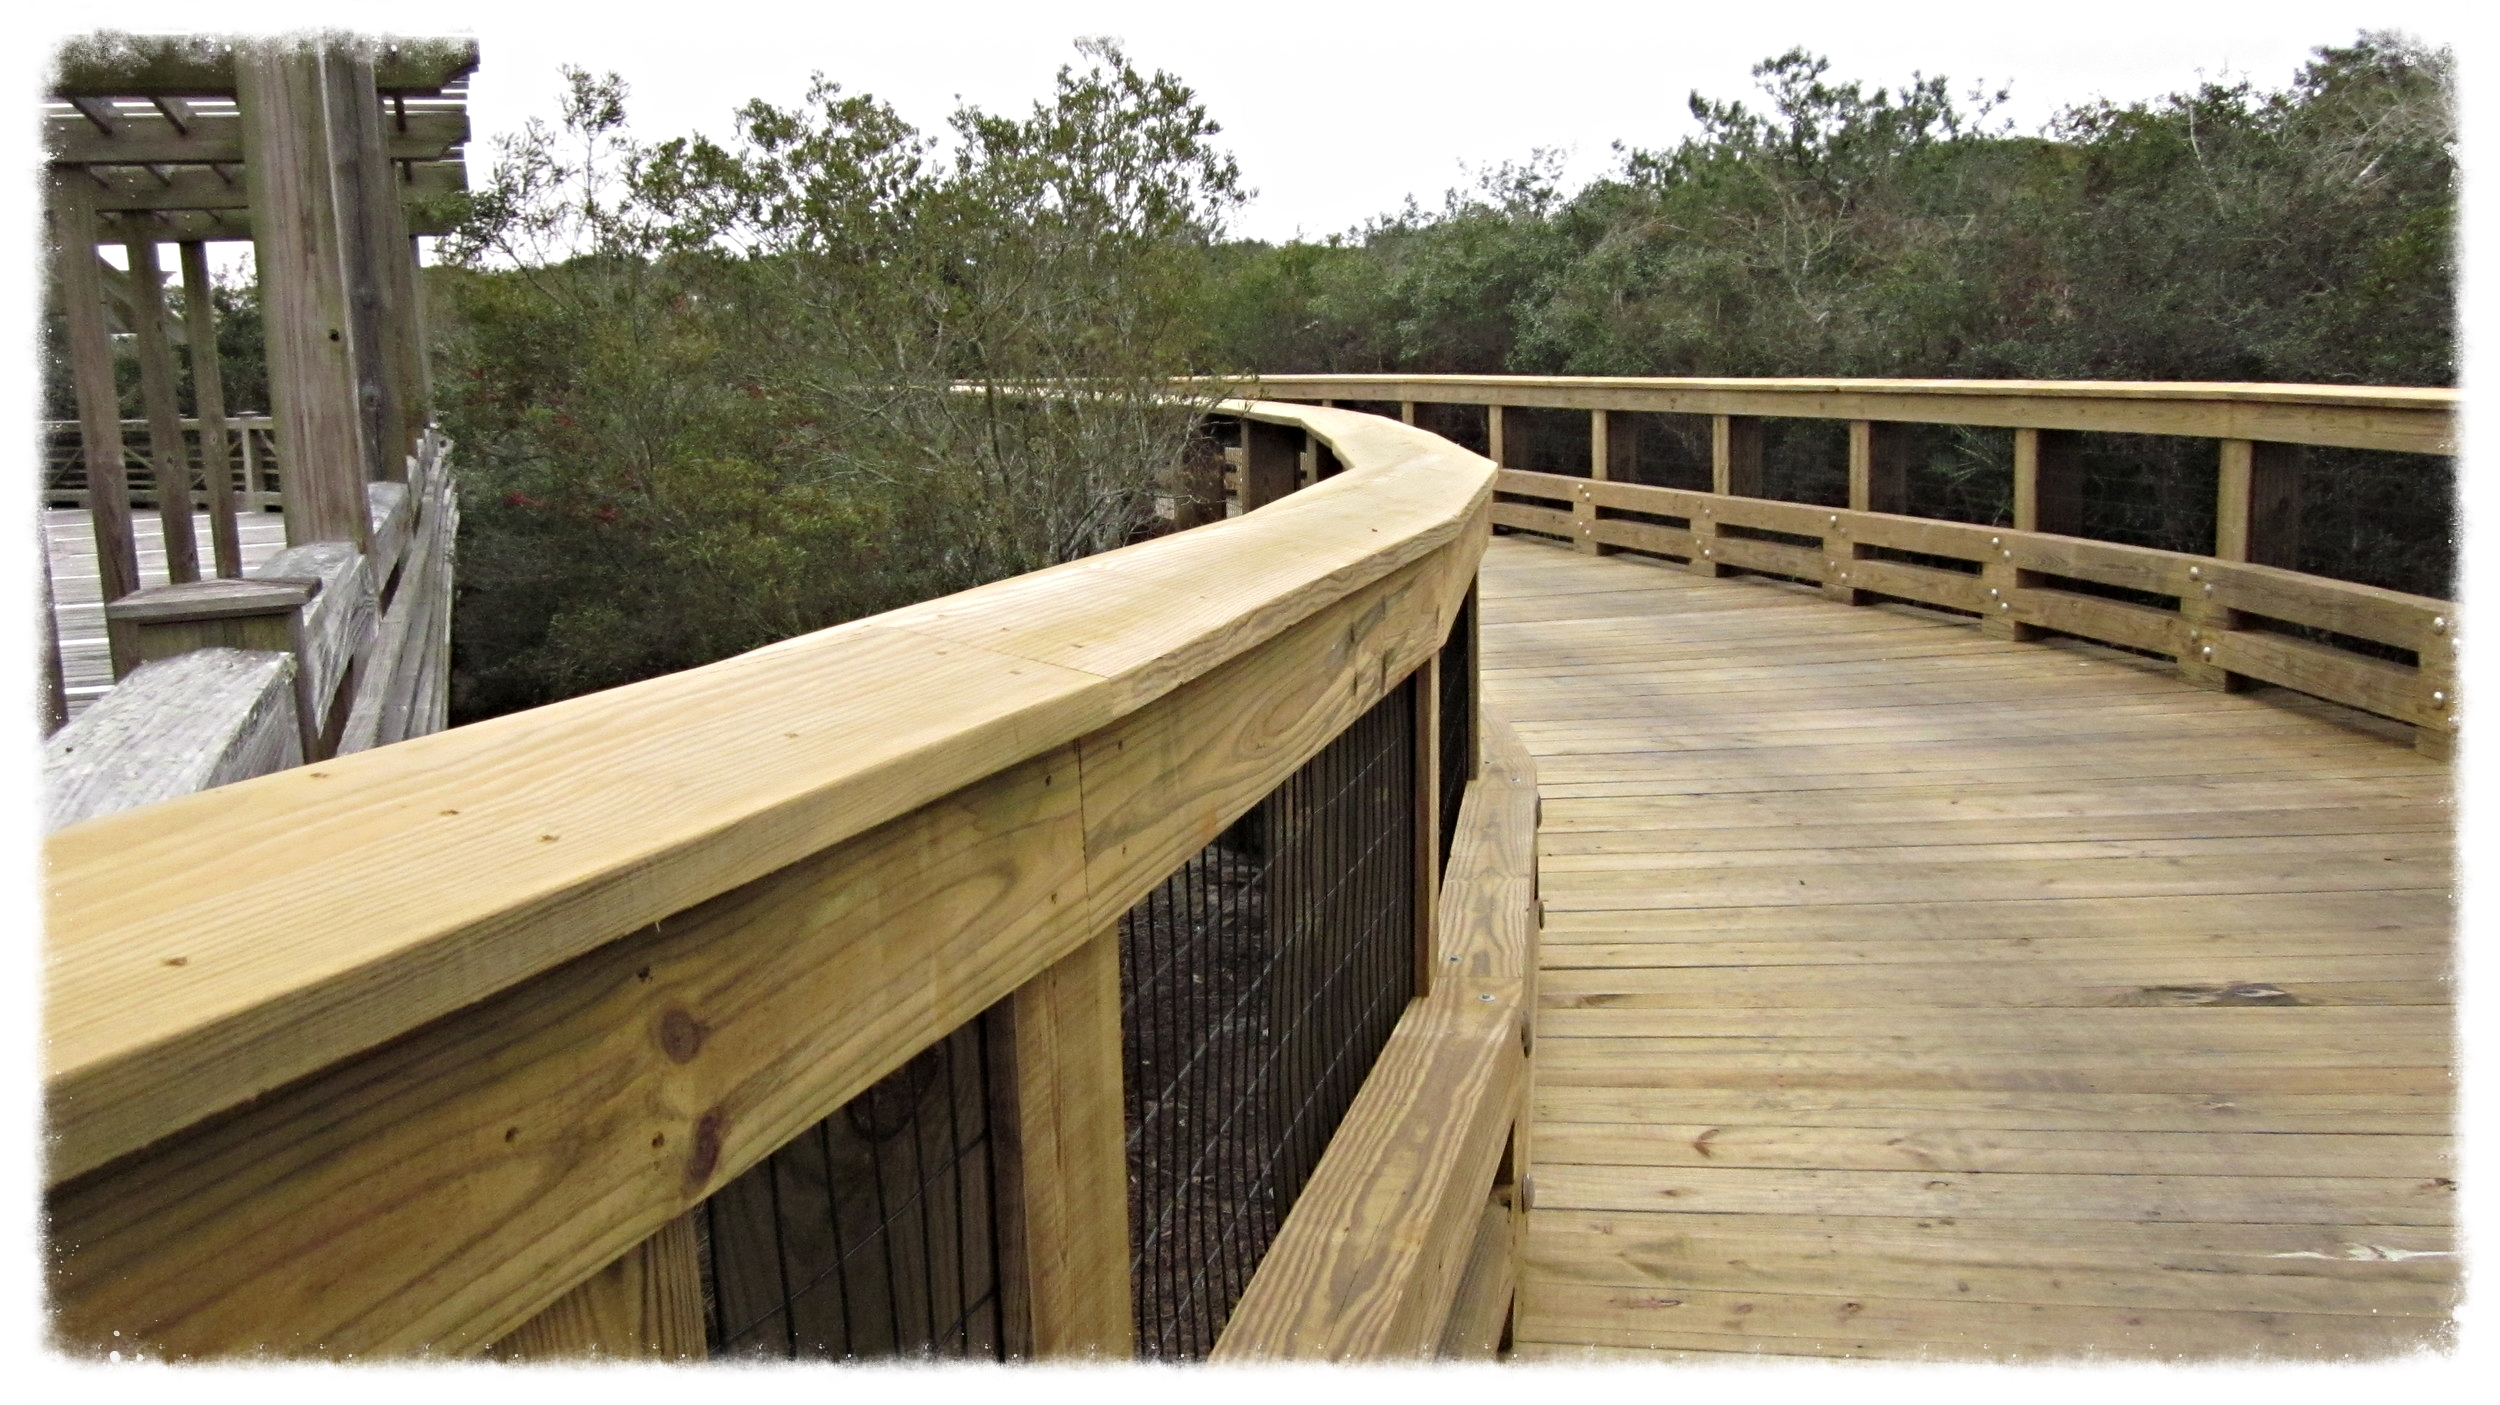 Wooden Boardwalk Dune Crossing Construction